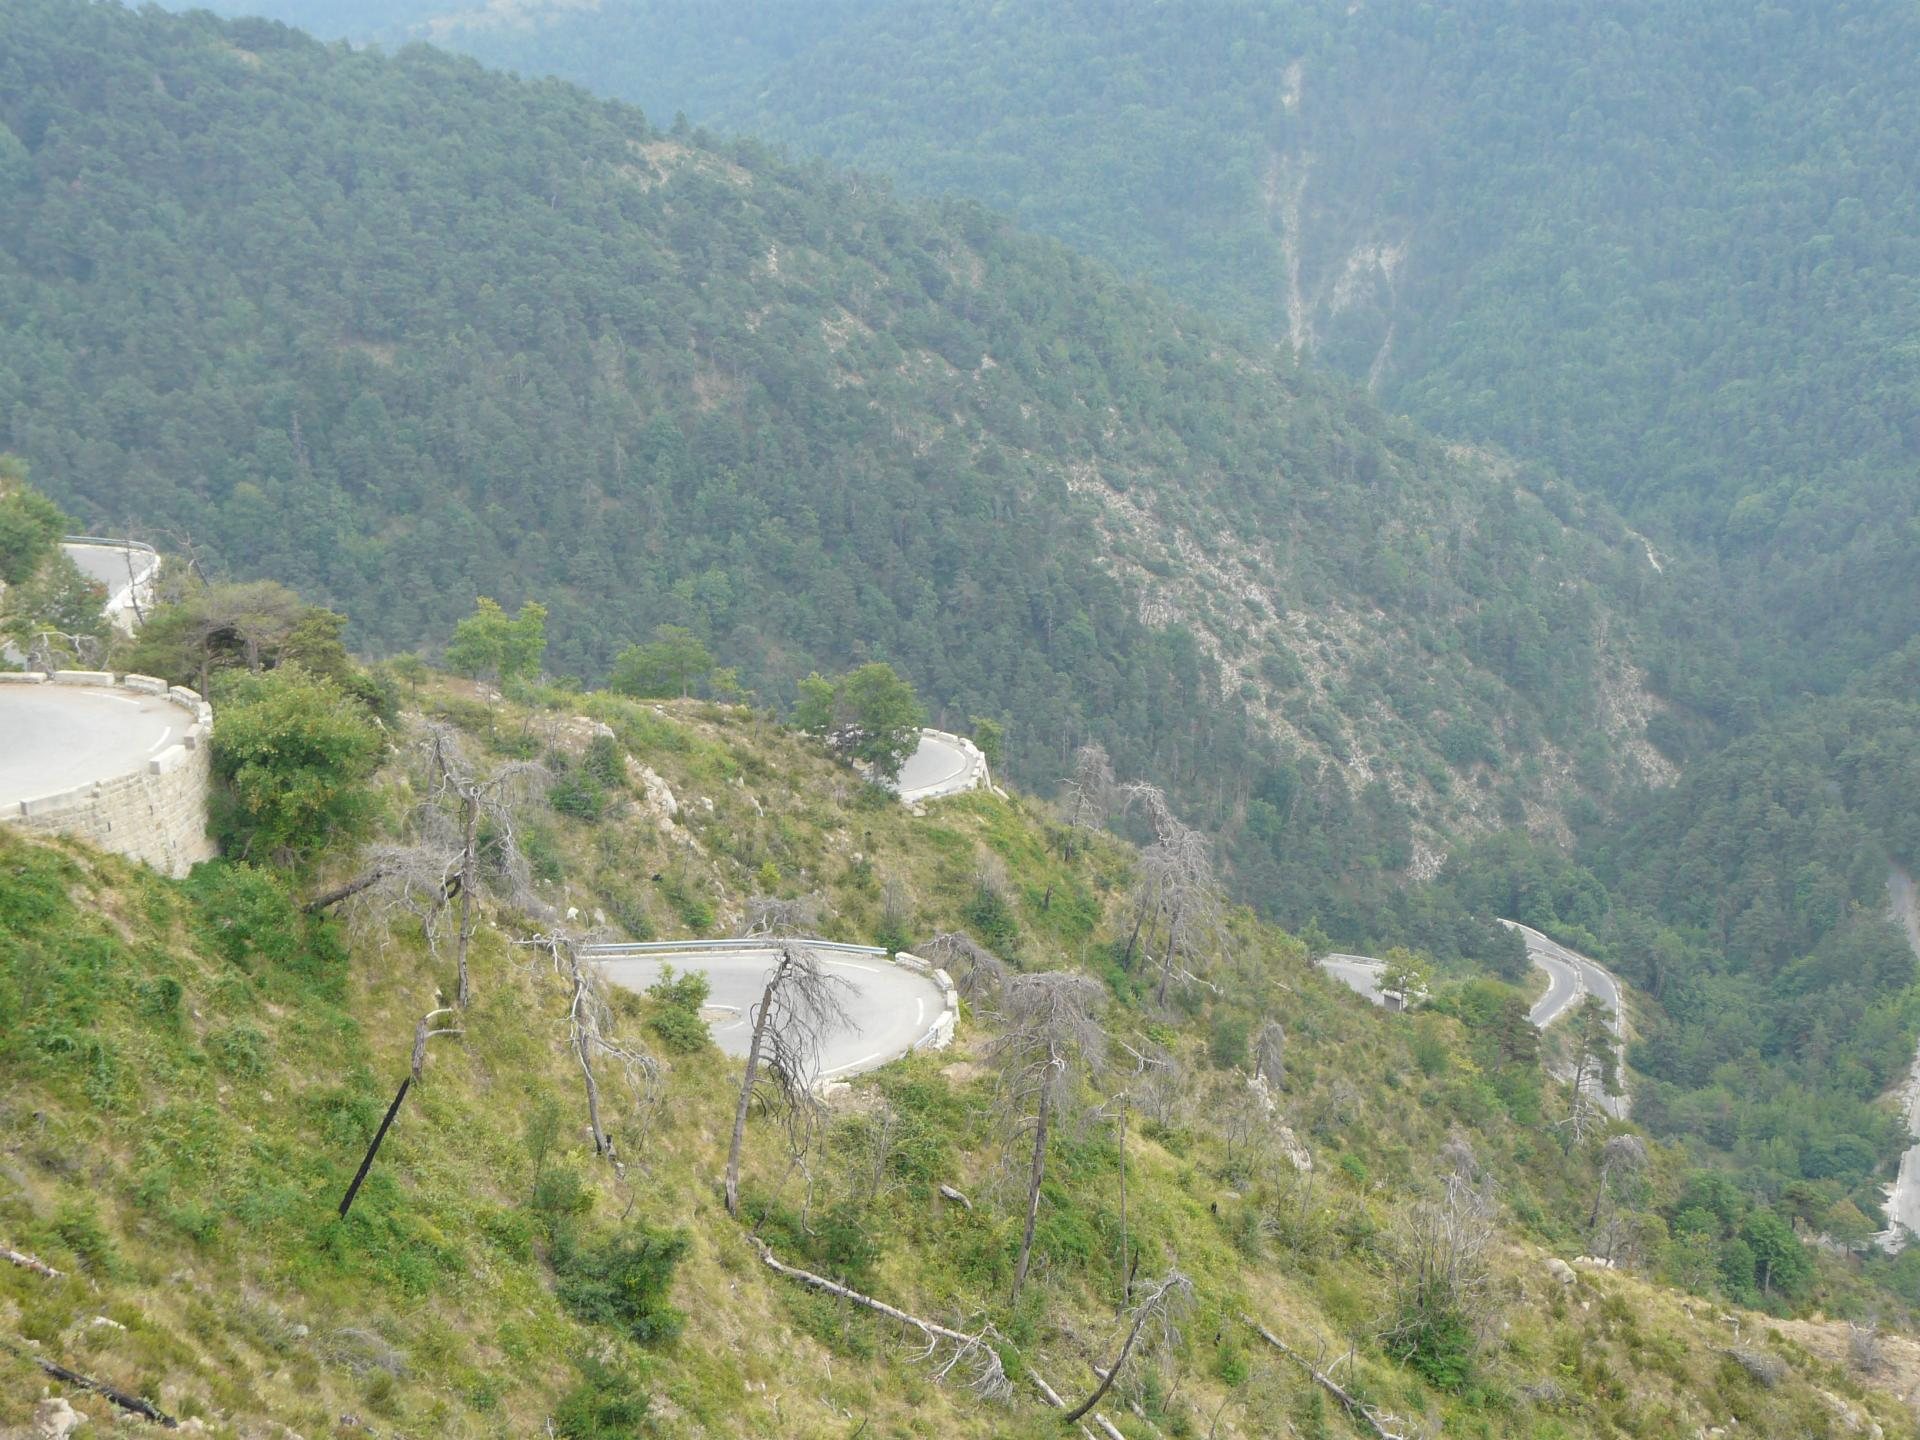 Col de Braus à vélo